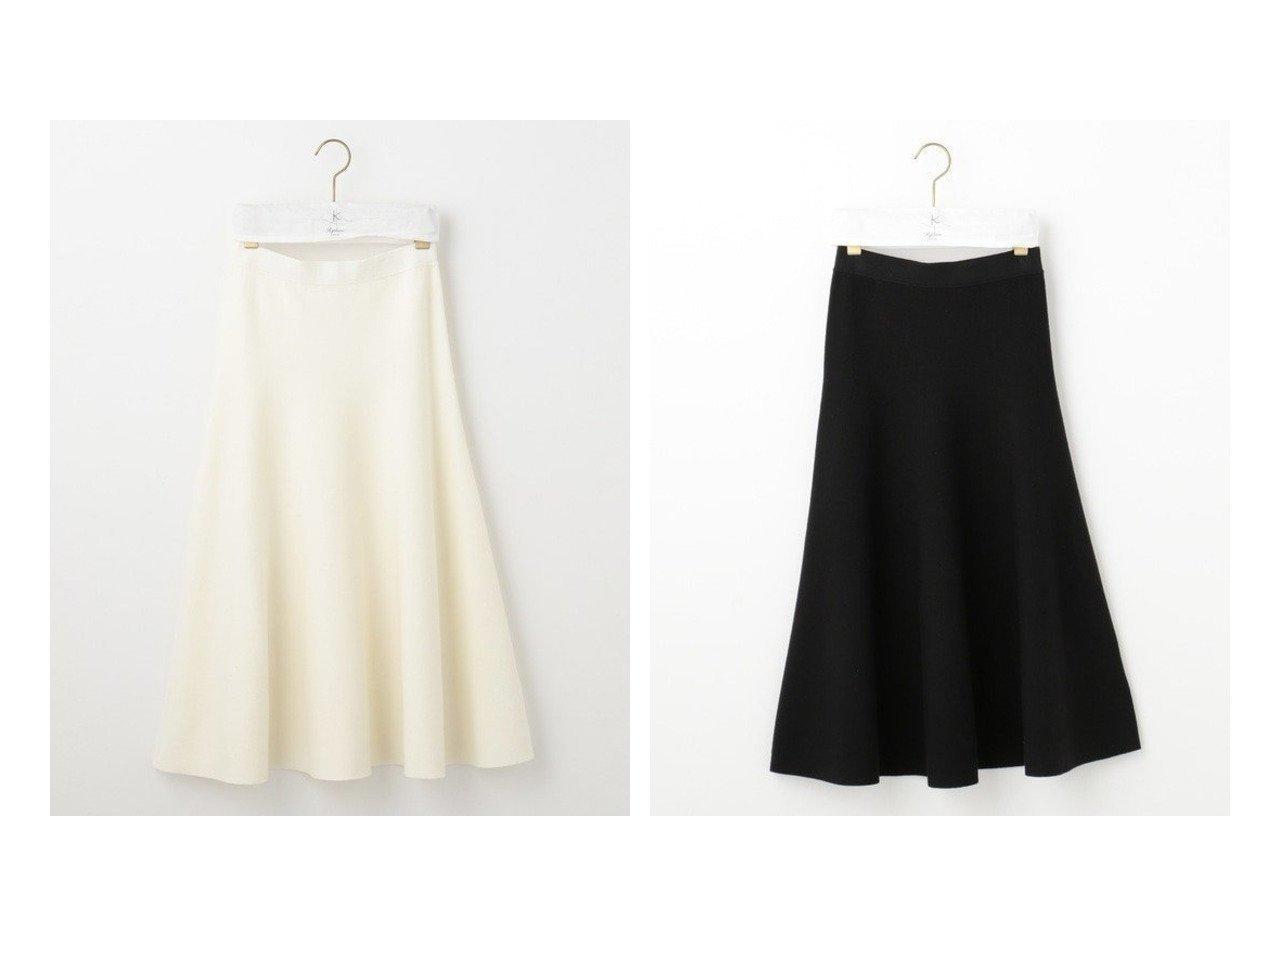 【KUMIKYOKU/組曲】の【Rythme KUMIKYOKU】Minimalism フレアスカート スカートのおすすめ!人気、トレンド・レディースファッションの通販  おすすめで人気の流行・トレンド、ファッションの通販商品 メンズファッション・キッズファッション・インテリア・家具・レディースファッション・服の通販 founy(ファニー) https://founy.com/ ファッション Fashion レディースファッション WOMEN スカート Skirt Aライン/フレアスカート Flared A-Line Skirts カラフル フレア プリント モチーフ リゾート 2020年 2020 2020 春夏 S/S SS Spring/Summer 2020 送料無料 Free Shipping |ID:crp329100000009759